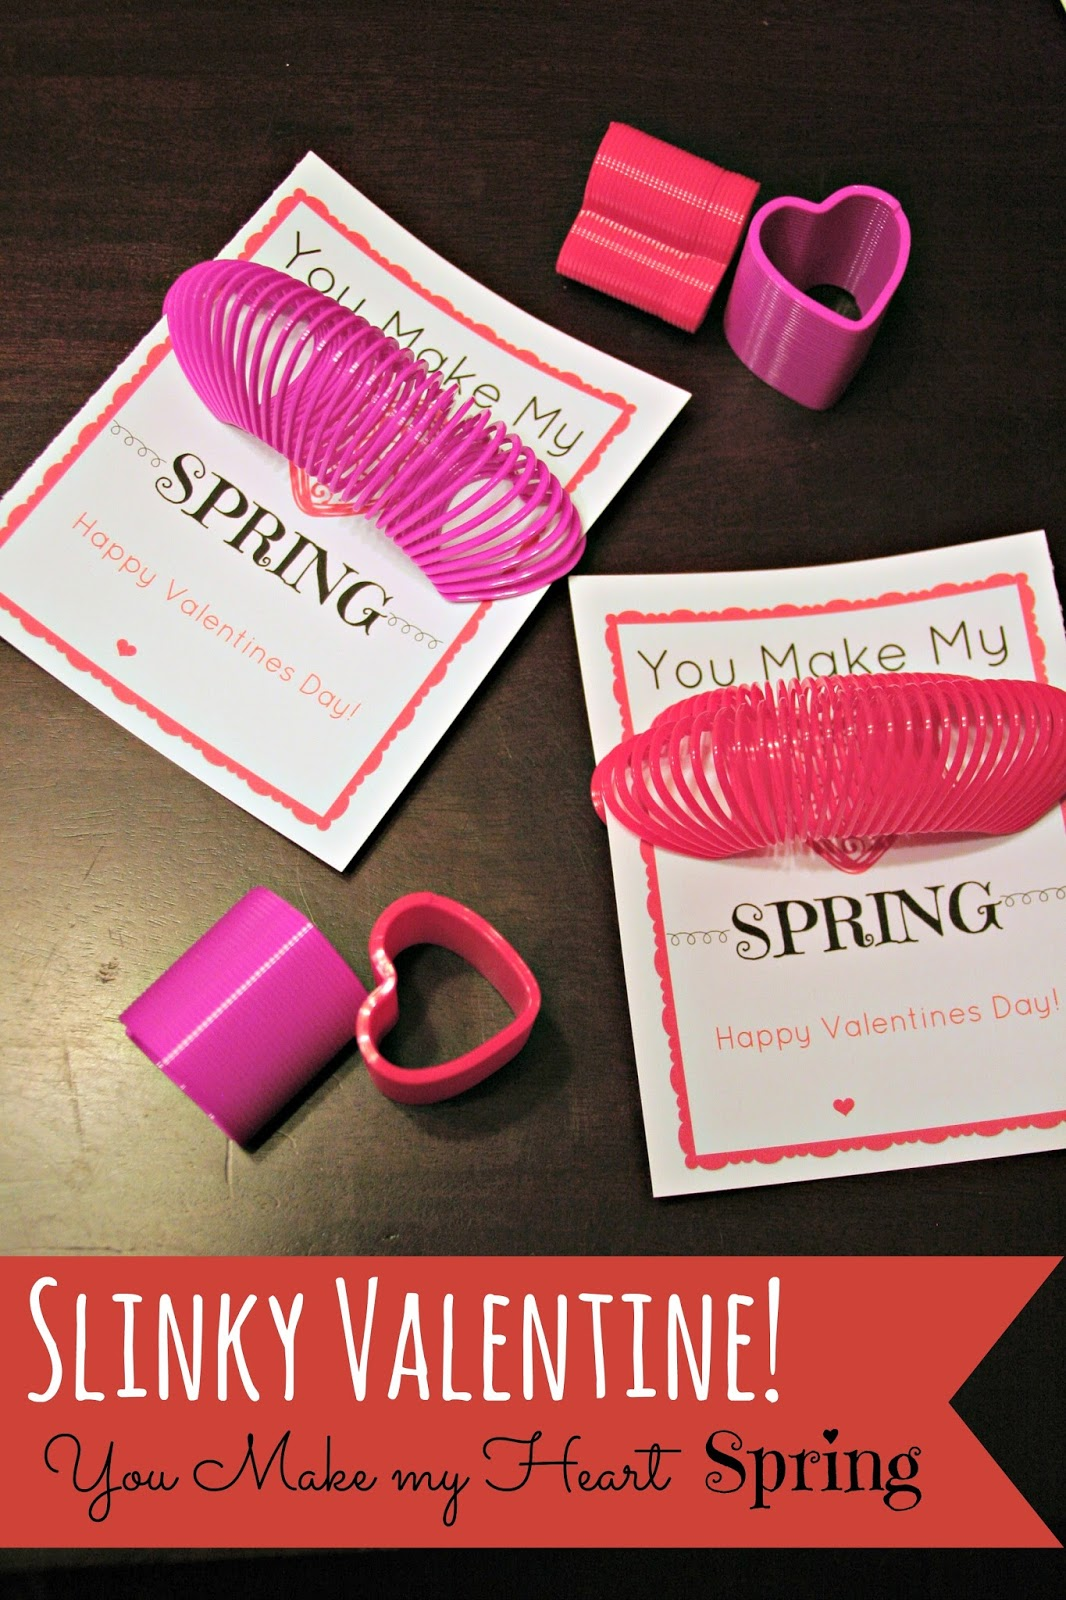 Valentines Day Printable, Valentines Slinky Idea, Valentines Printable  Slinky, Valentines Day Cards On